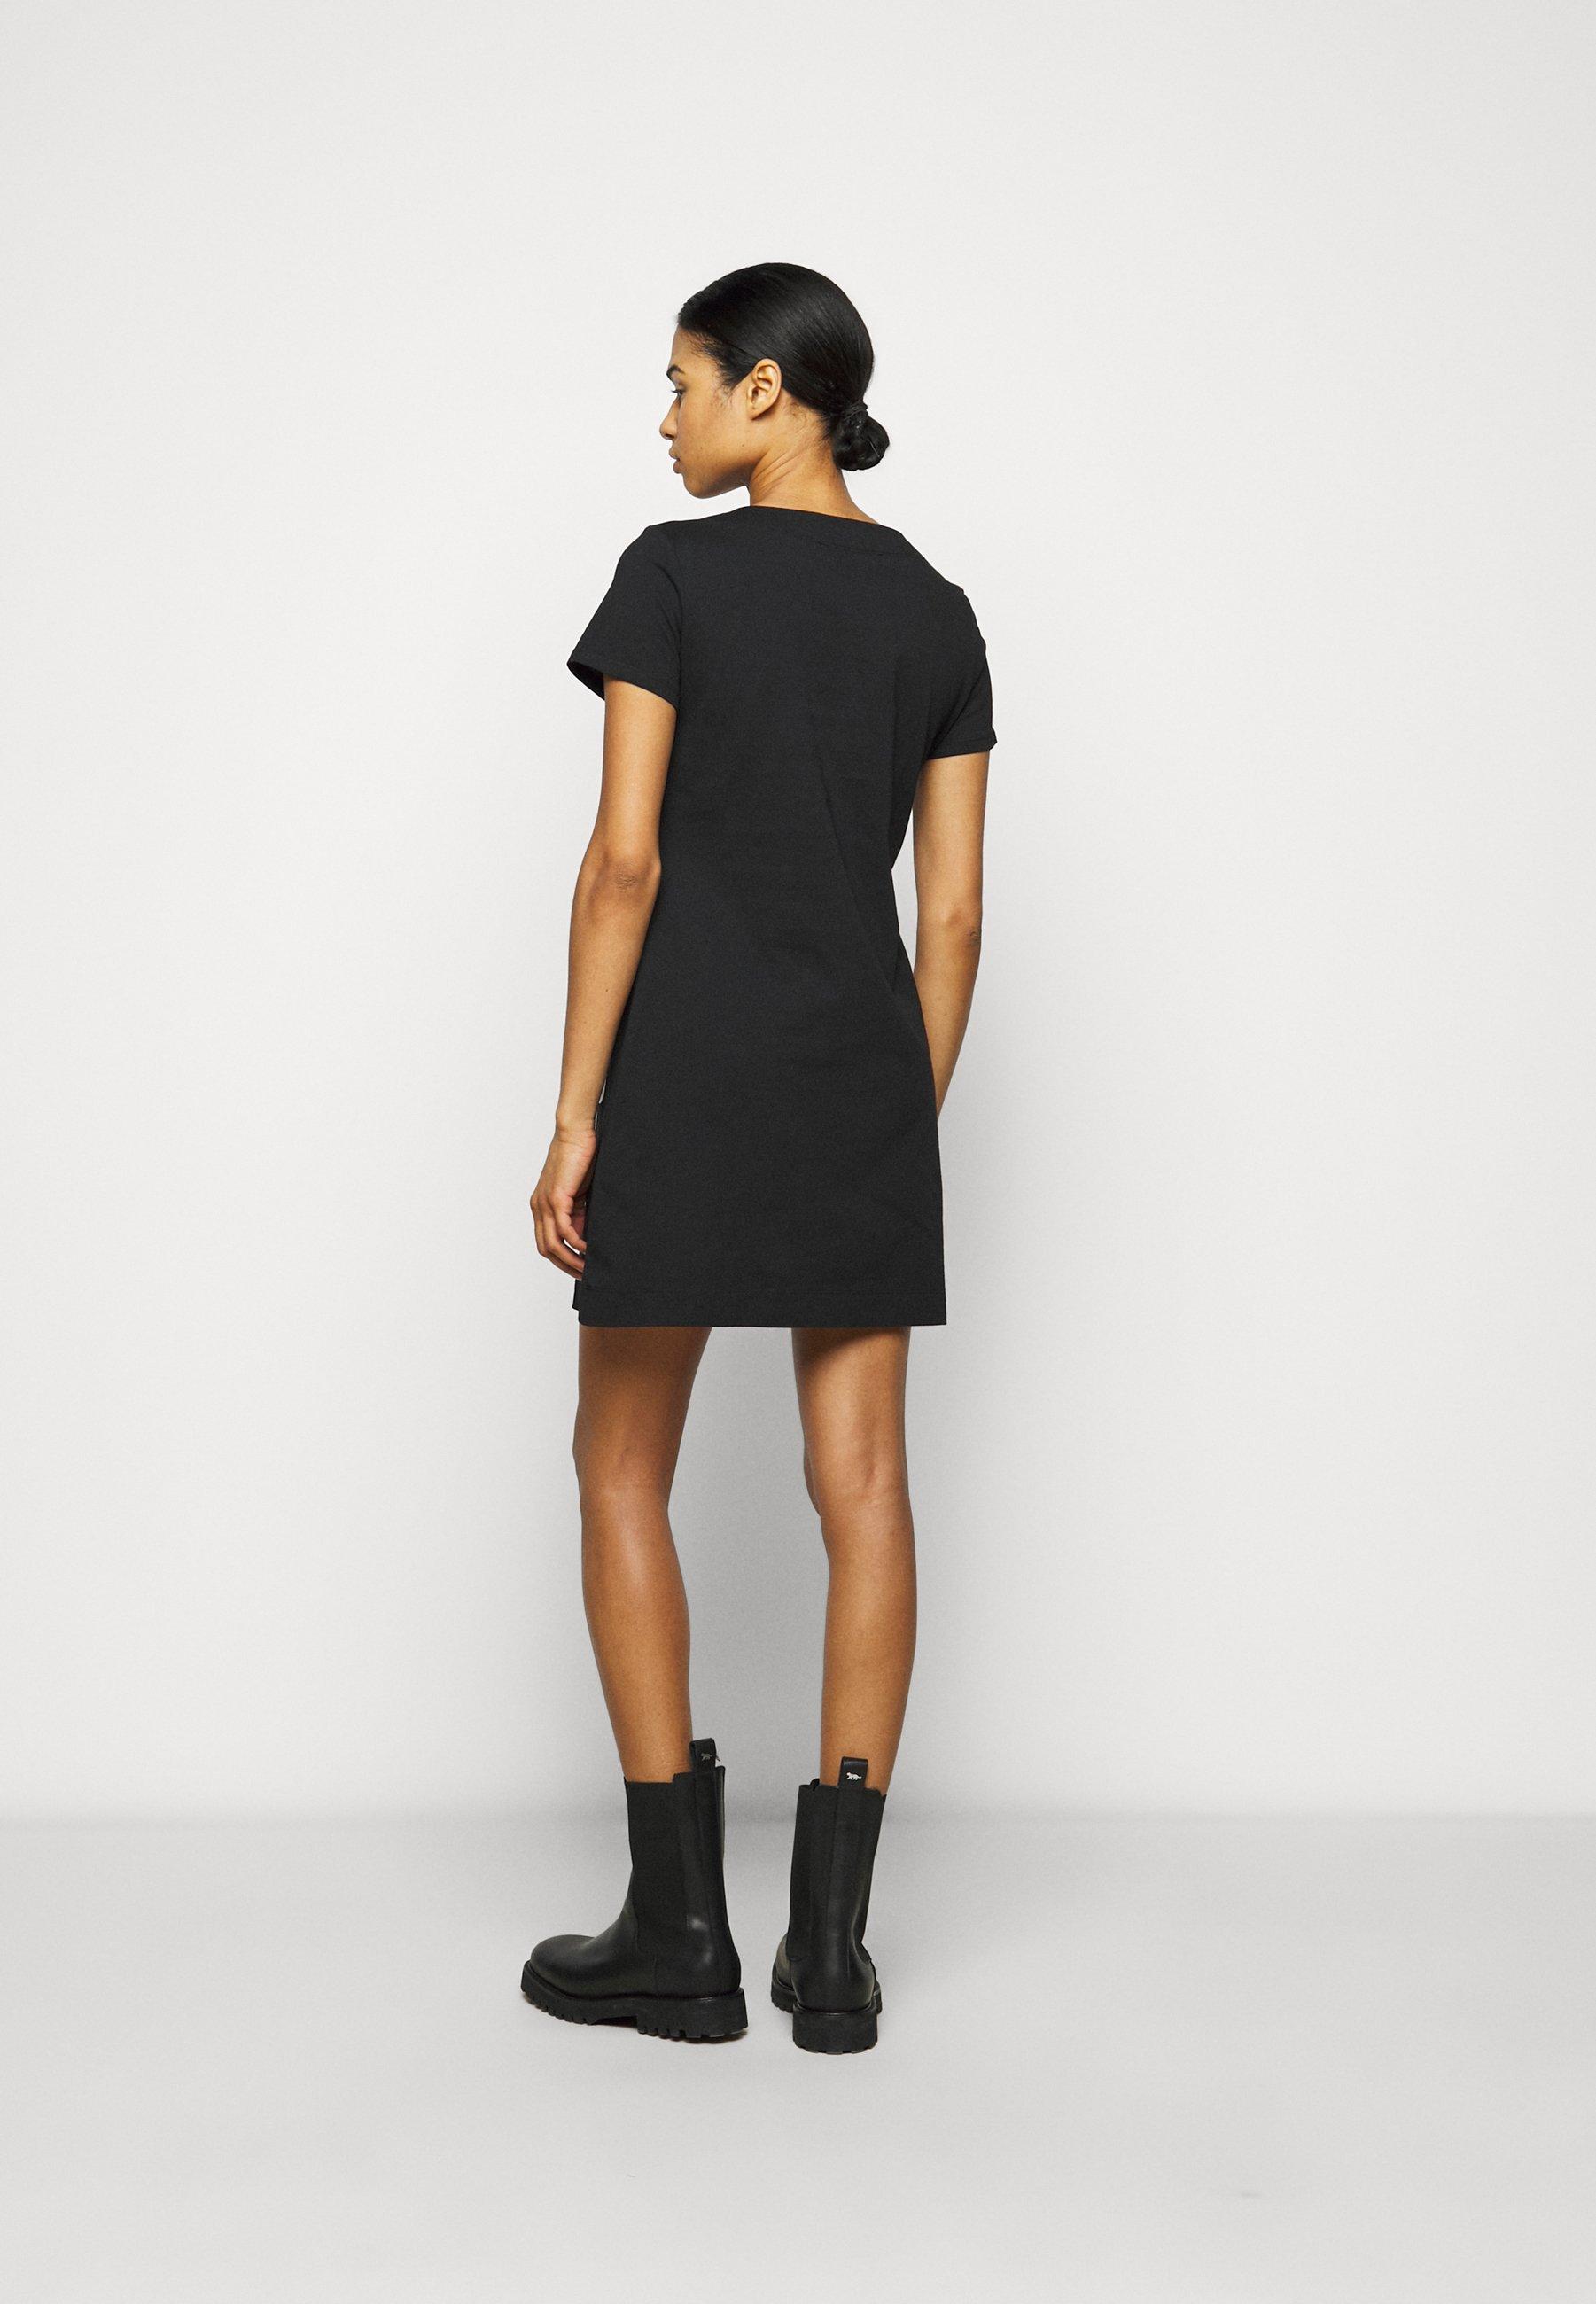 LOVE MOSCHINO | Dresses | W5929 14 M3876C74